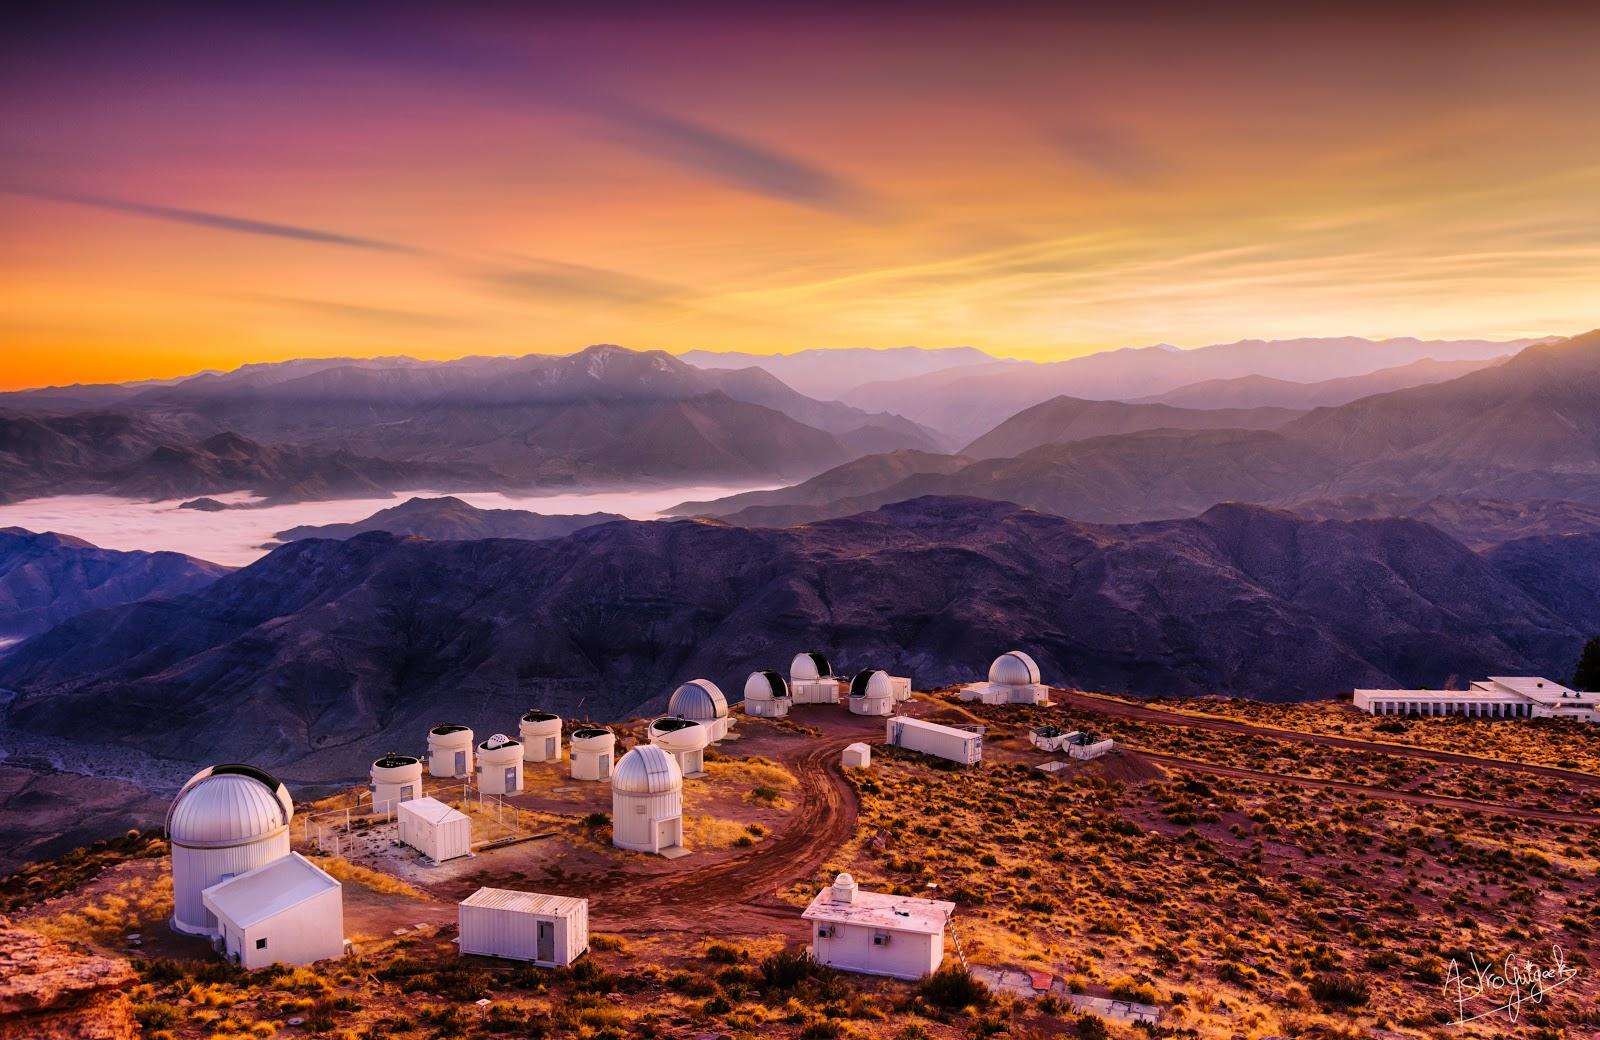 Sunrise over Cerro Tololo Observatory